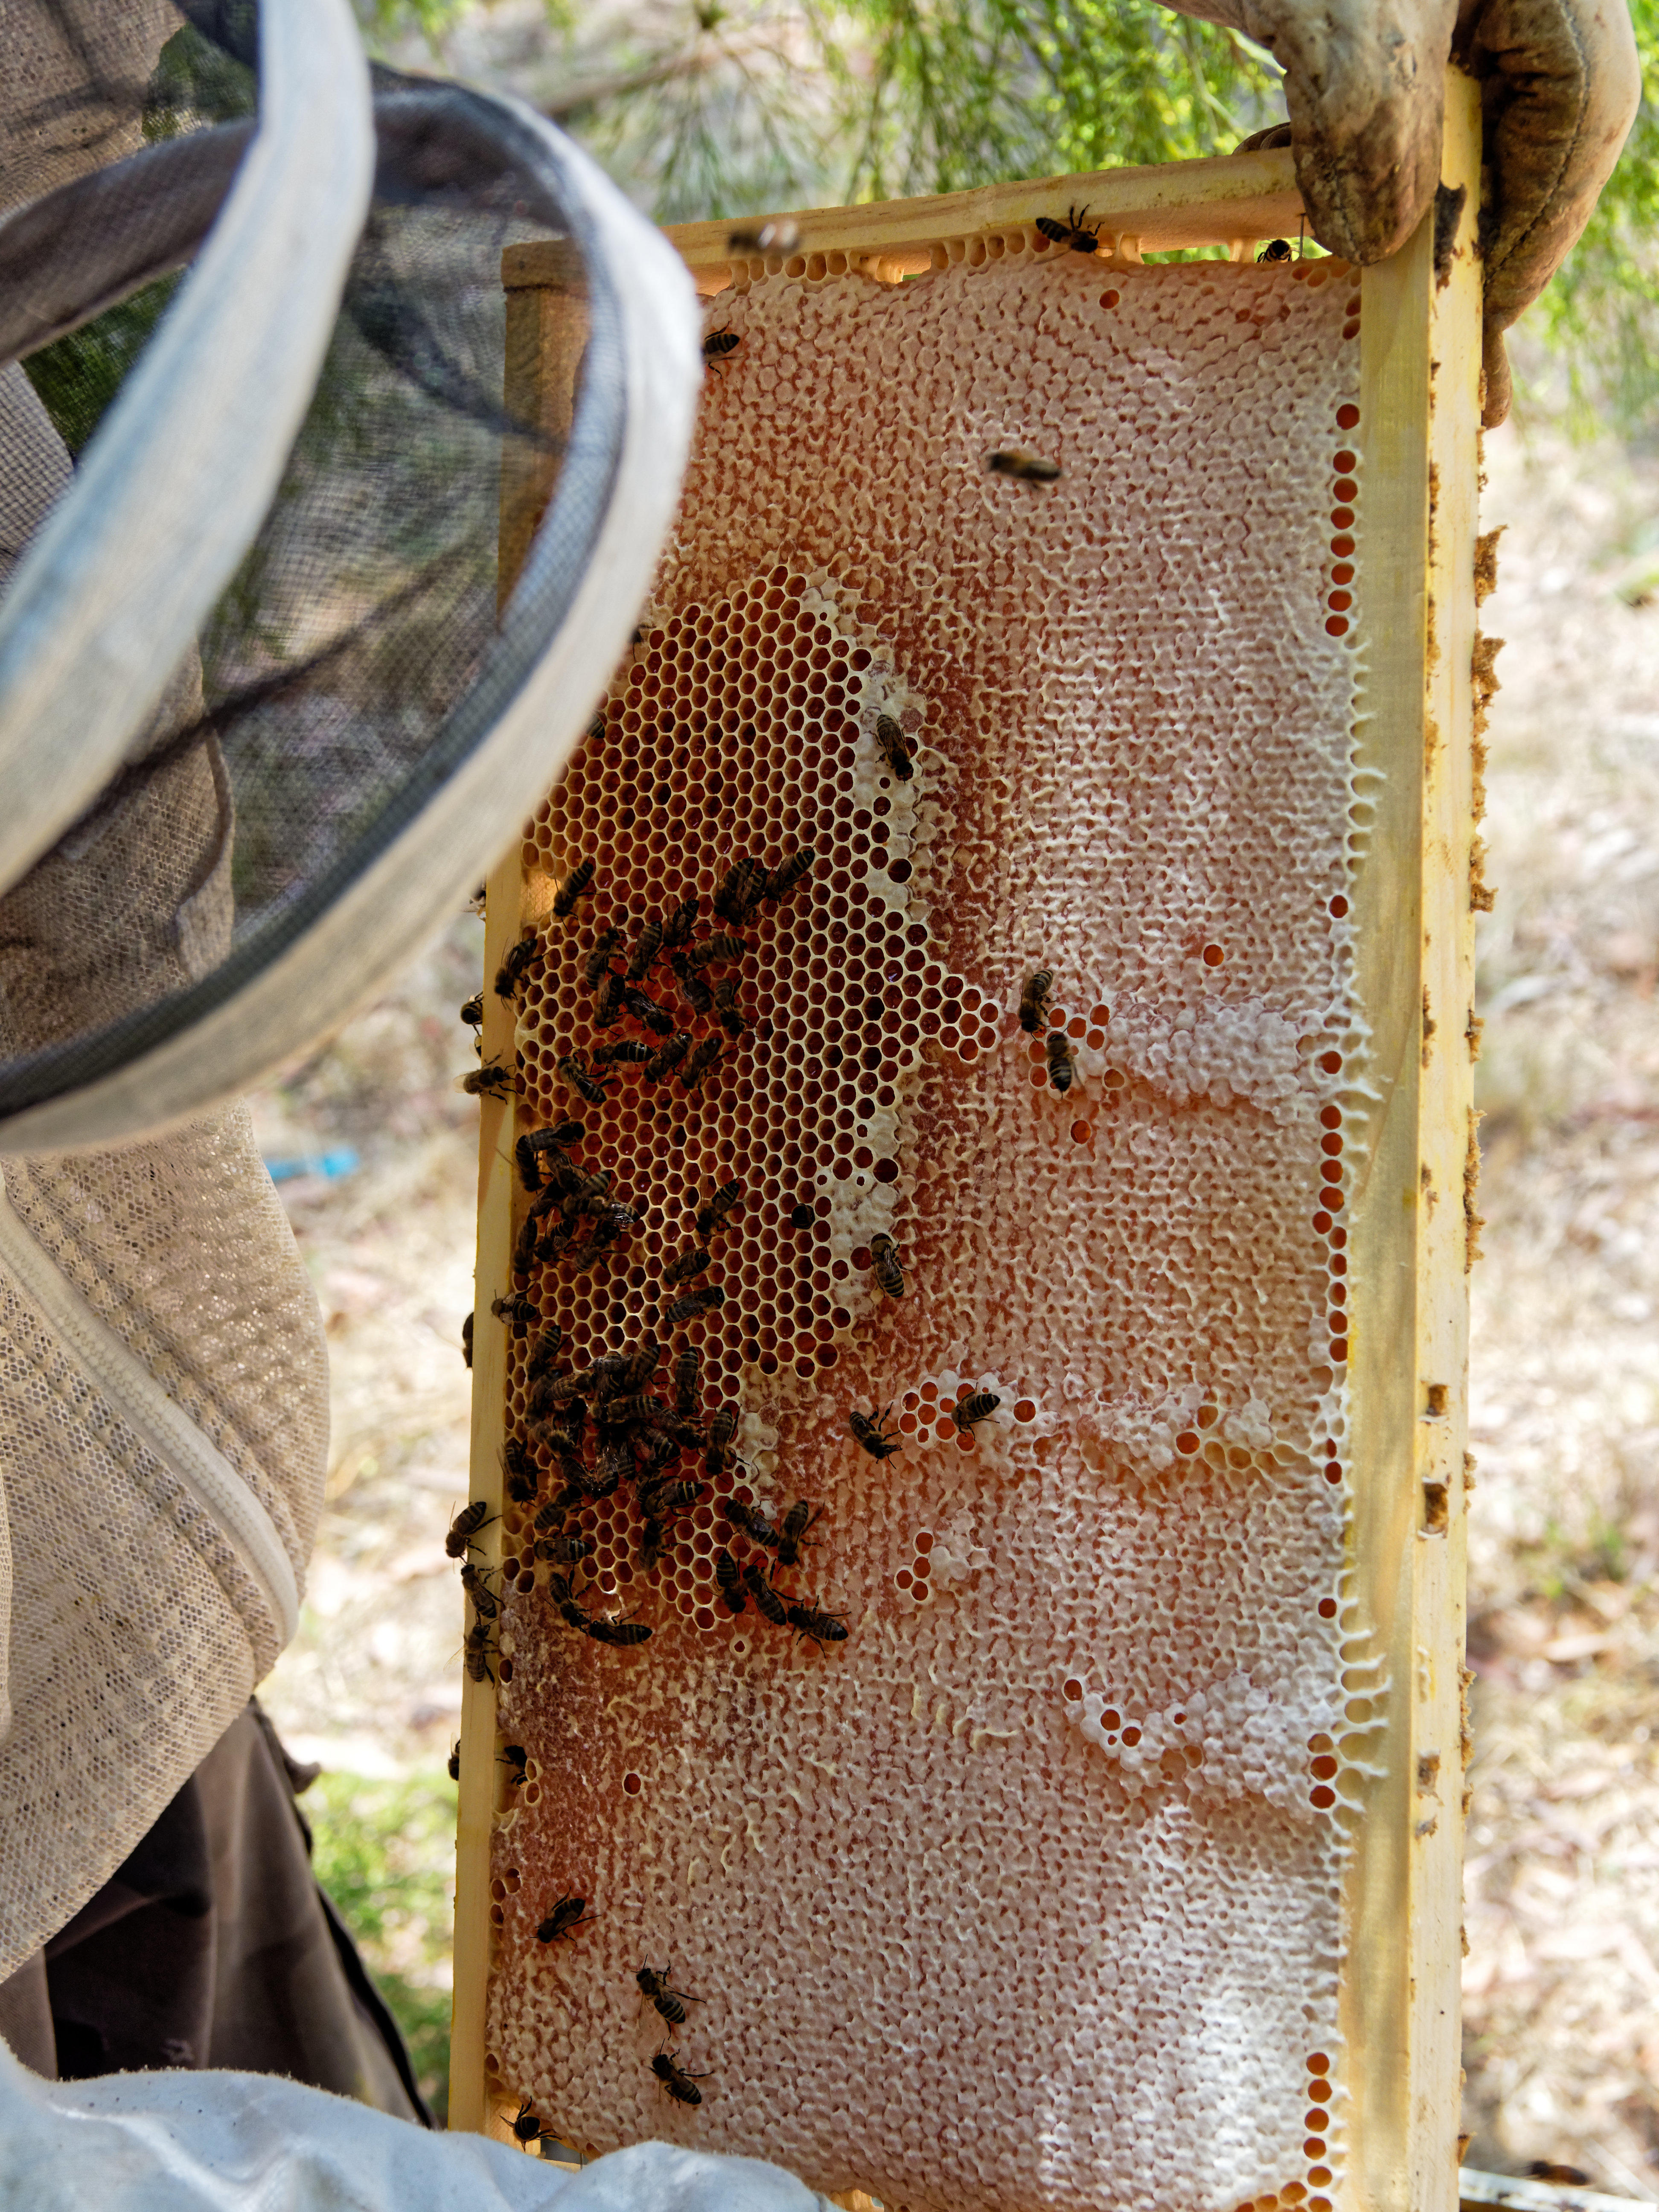 Inspecting-beehives-76.jpeg